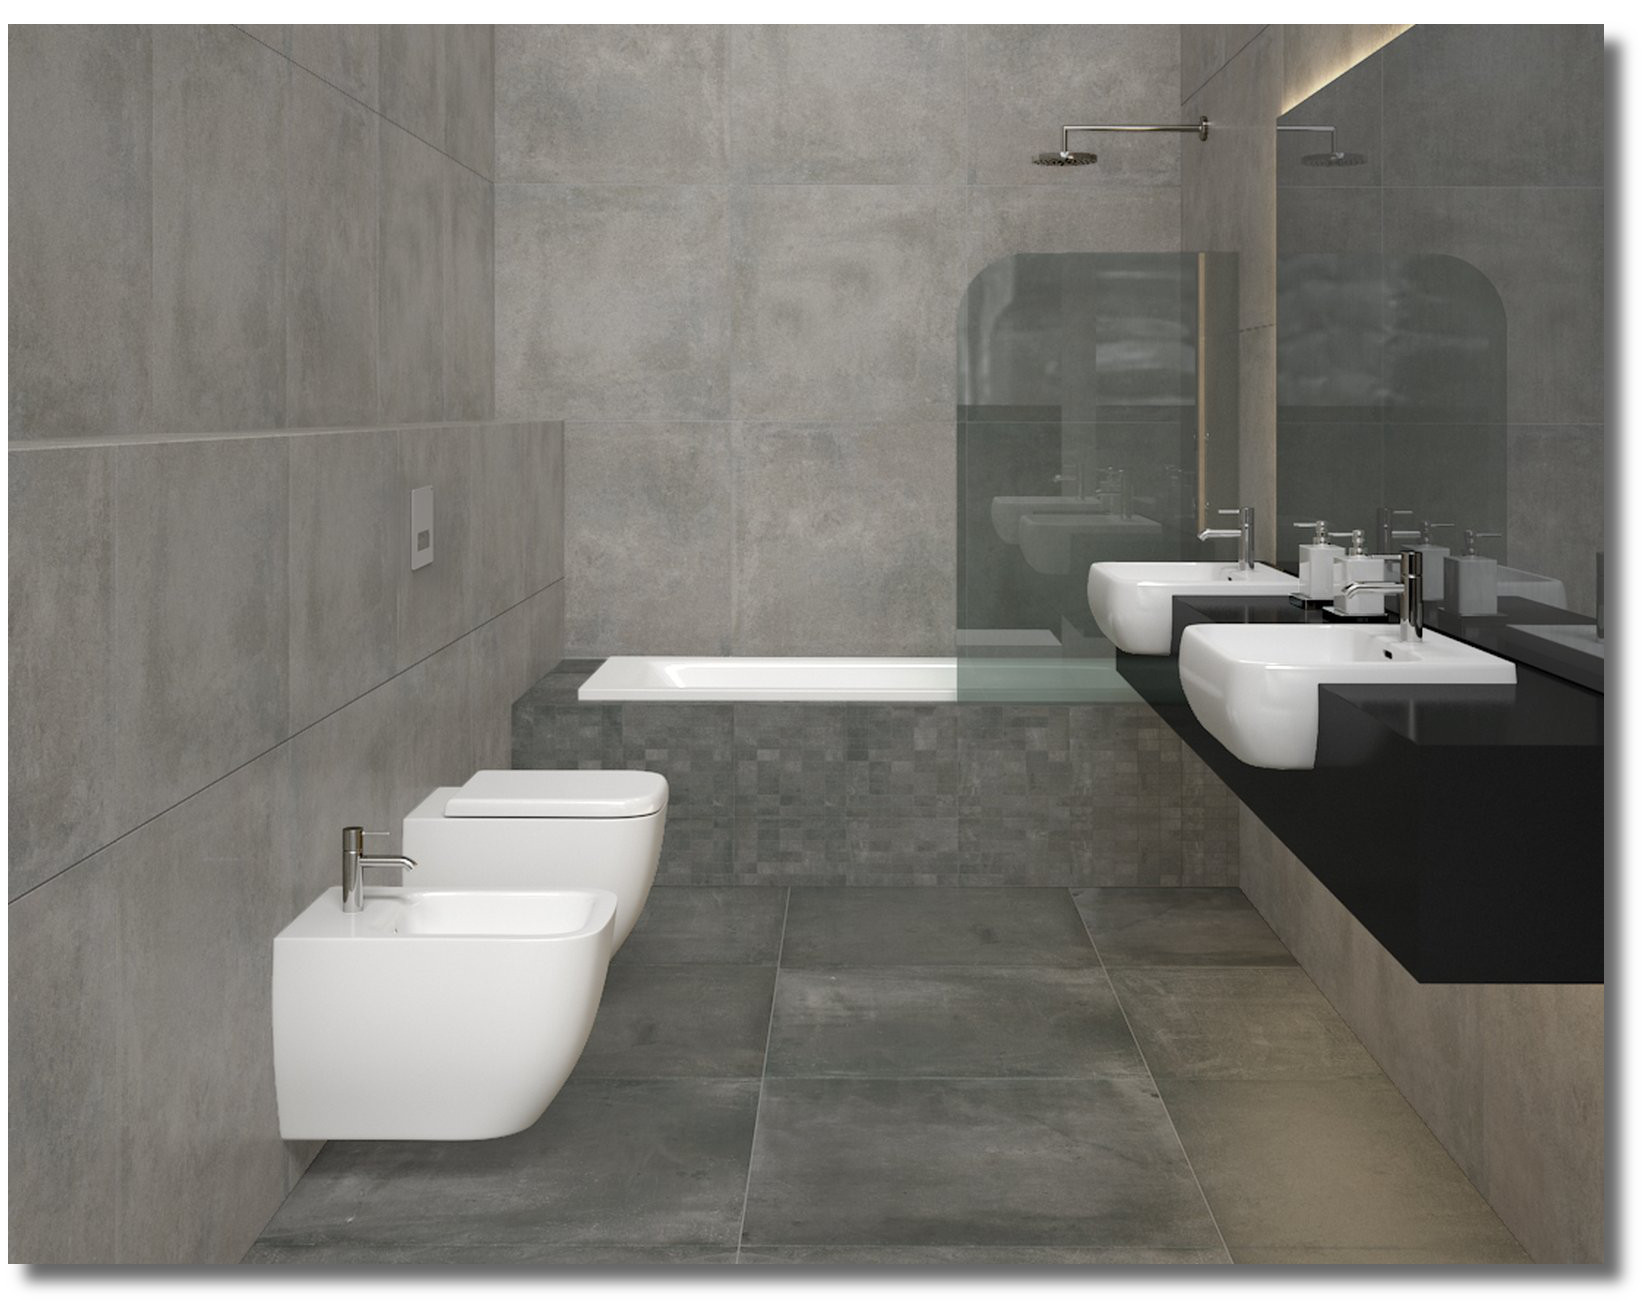 Rifacimento Bagno Completo Padova ristrutturazione e rifacimento bagno padova